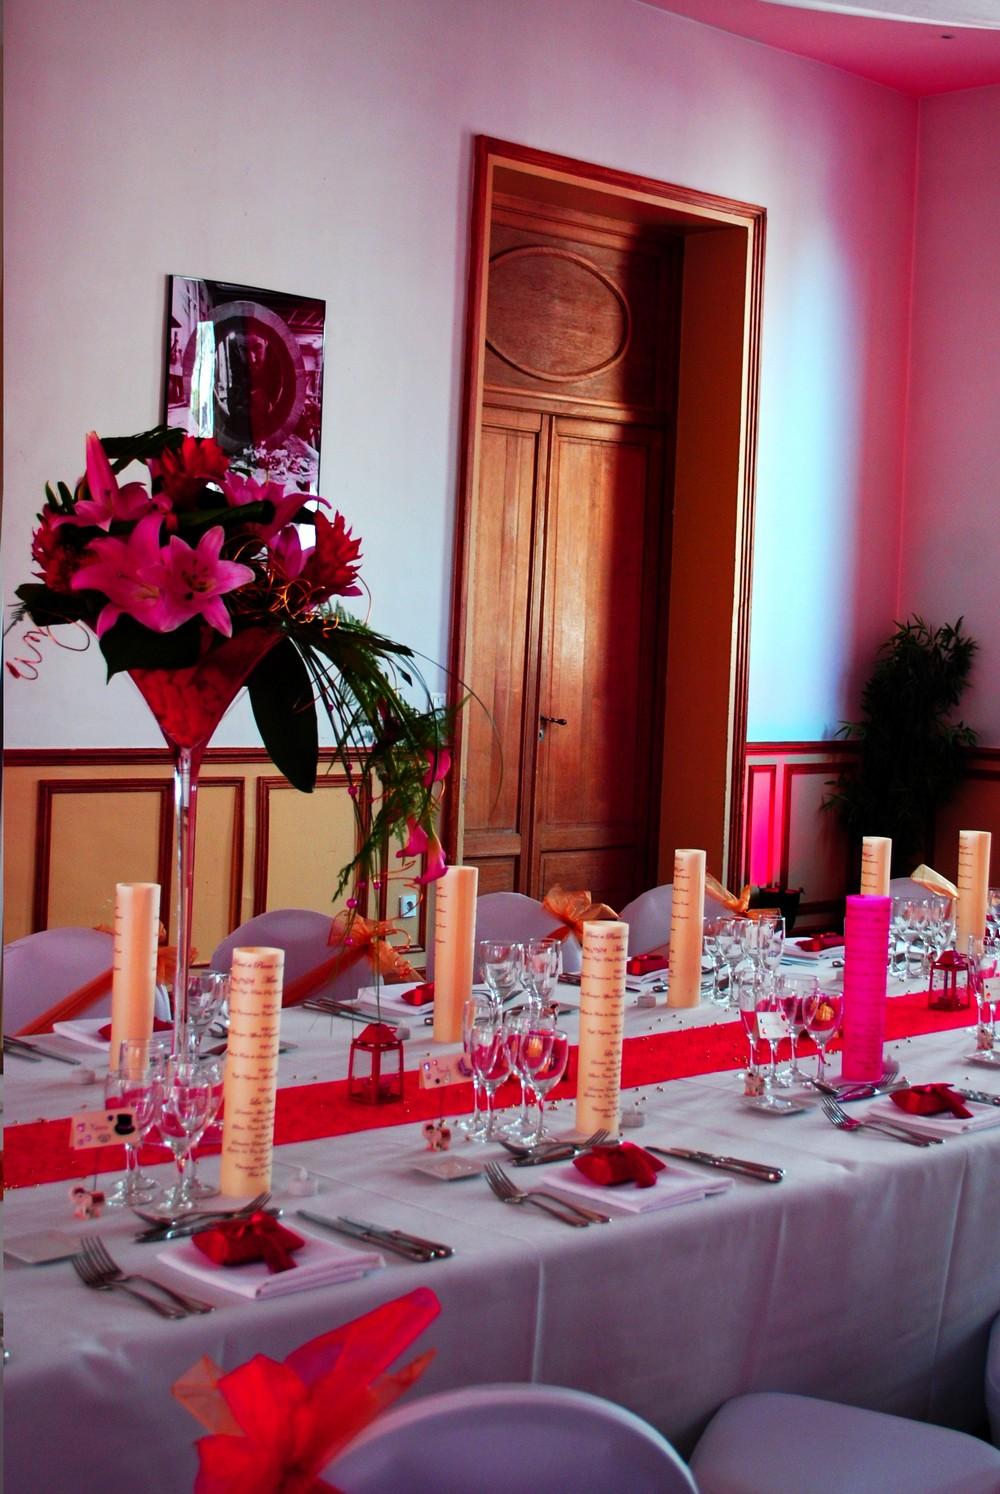 mariage au cercle colbert rouge et or etoile de rose. Black Bedroom Furniture Sets. Home Design Ideas